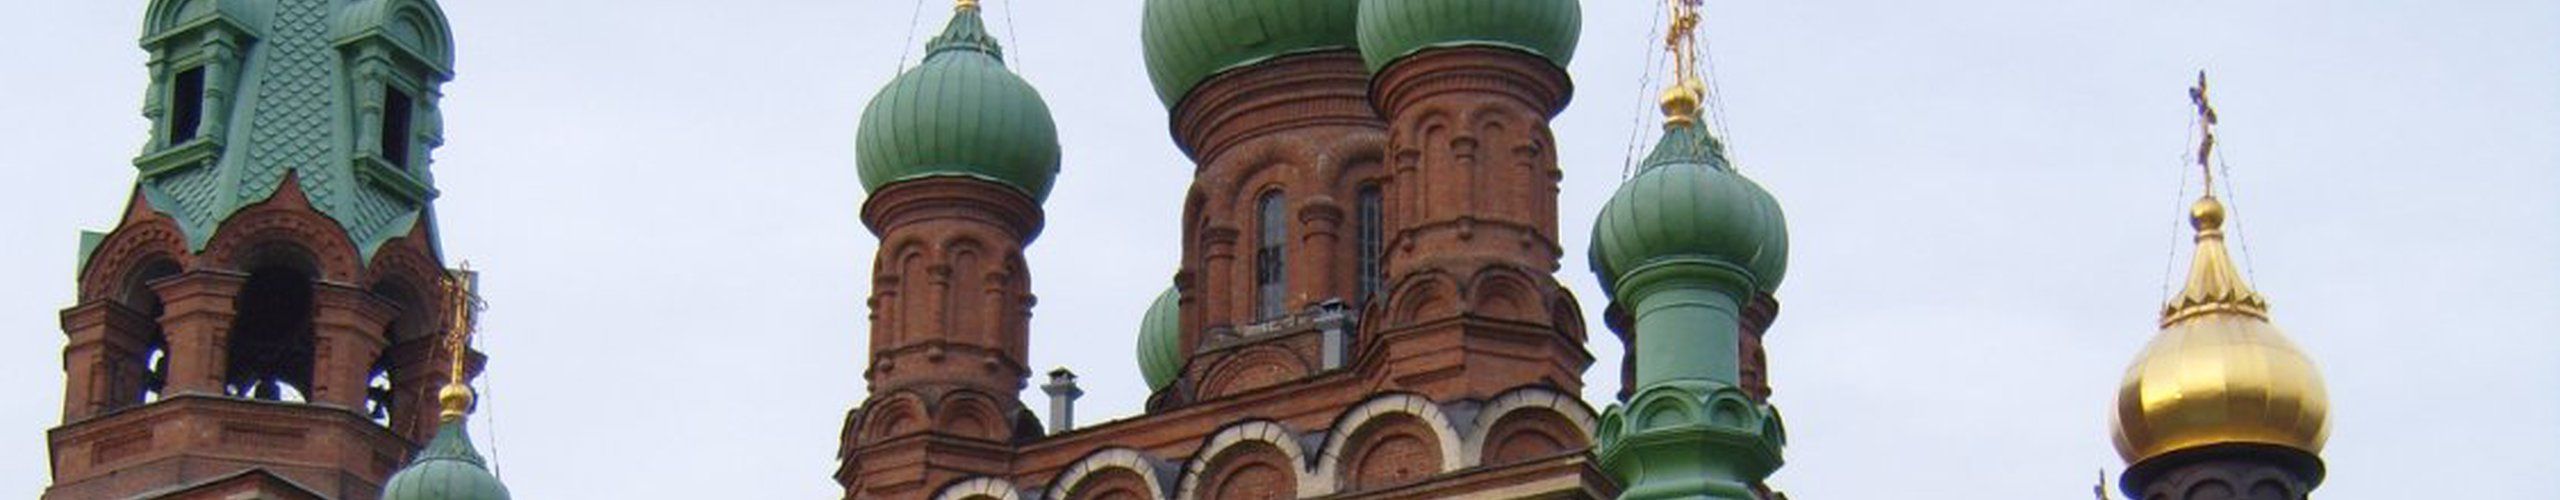 Holy Trinity Cathedral Krasnodar Tripadvisor